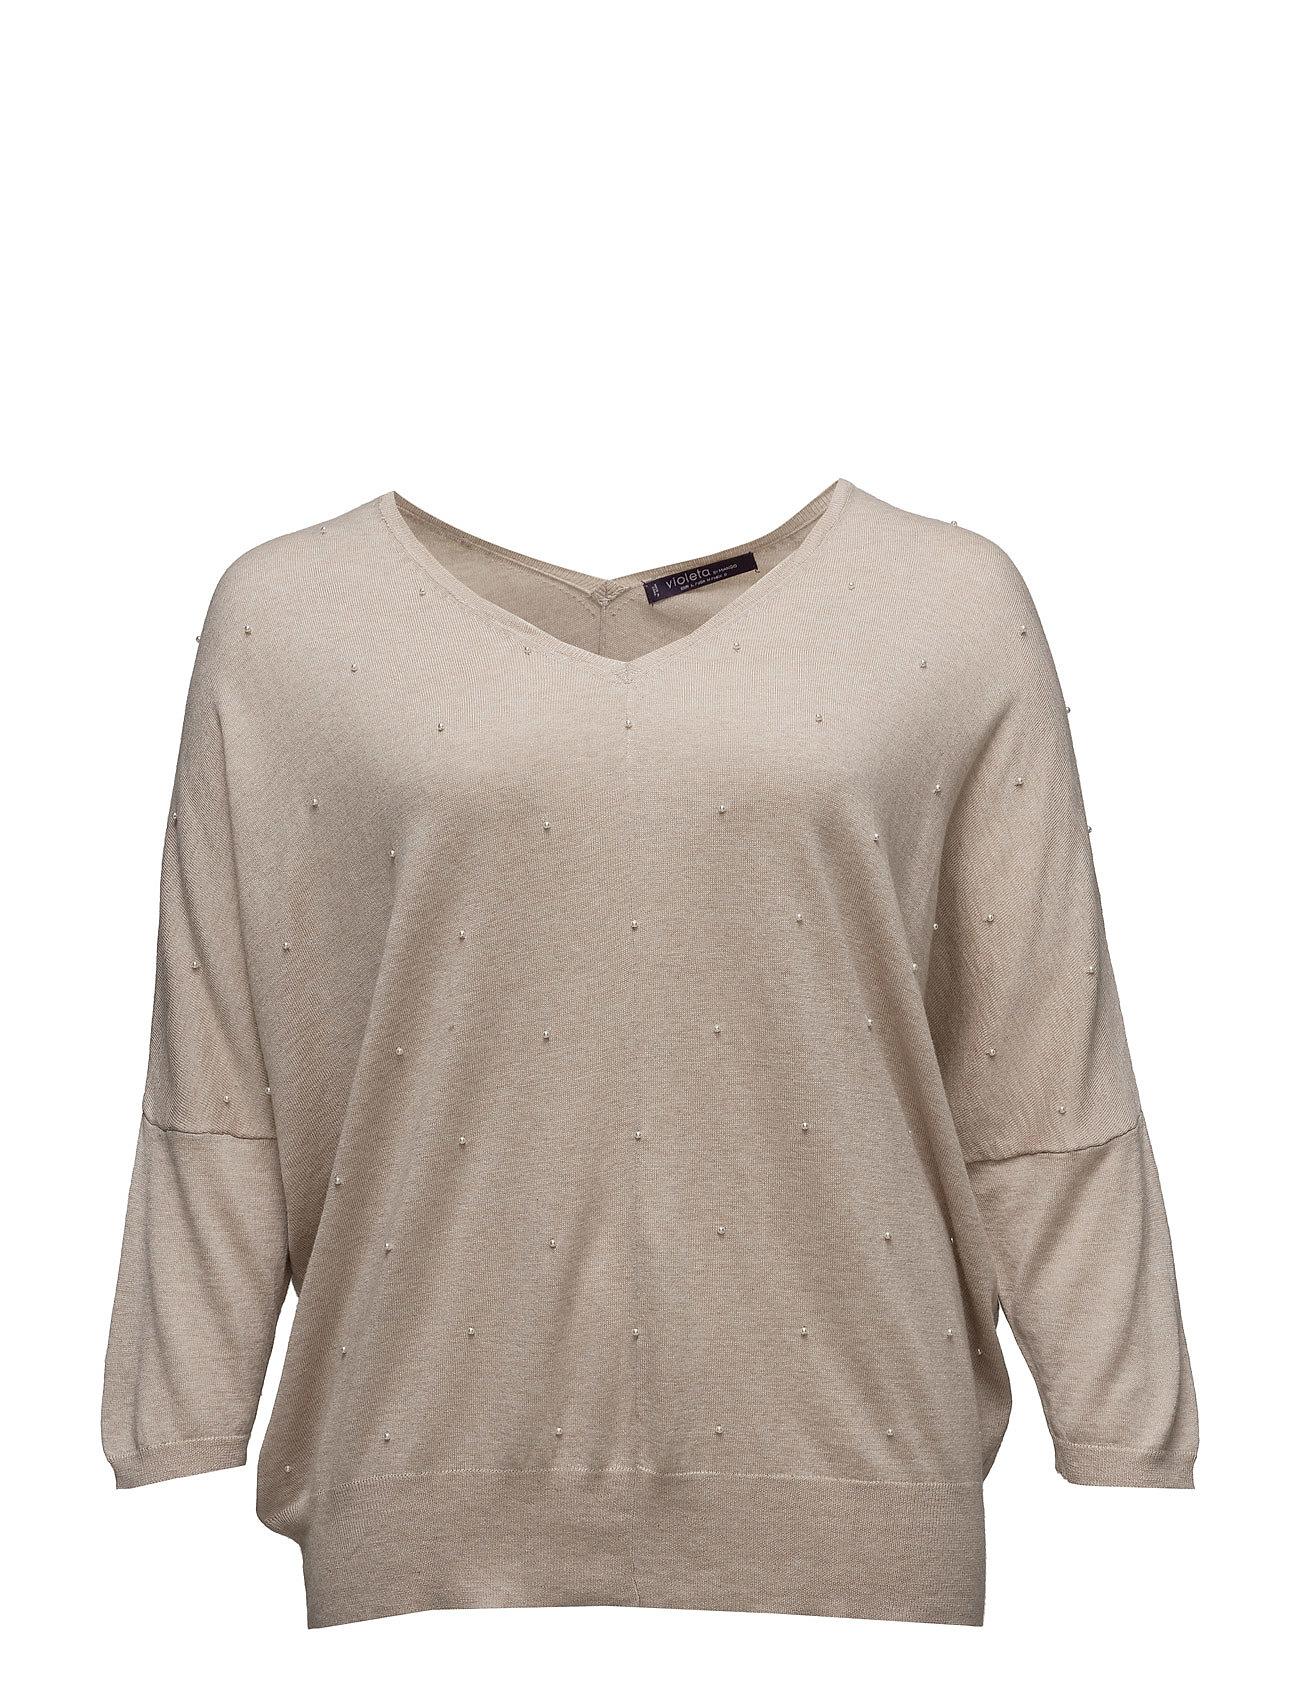 Beaded Wool-Blend Sweater Violeta by Mango Sweatshirts til Damer i Light Beige